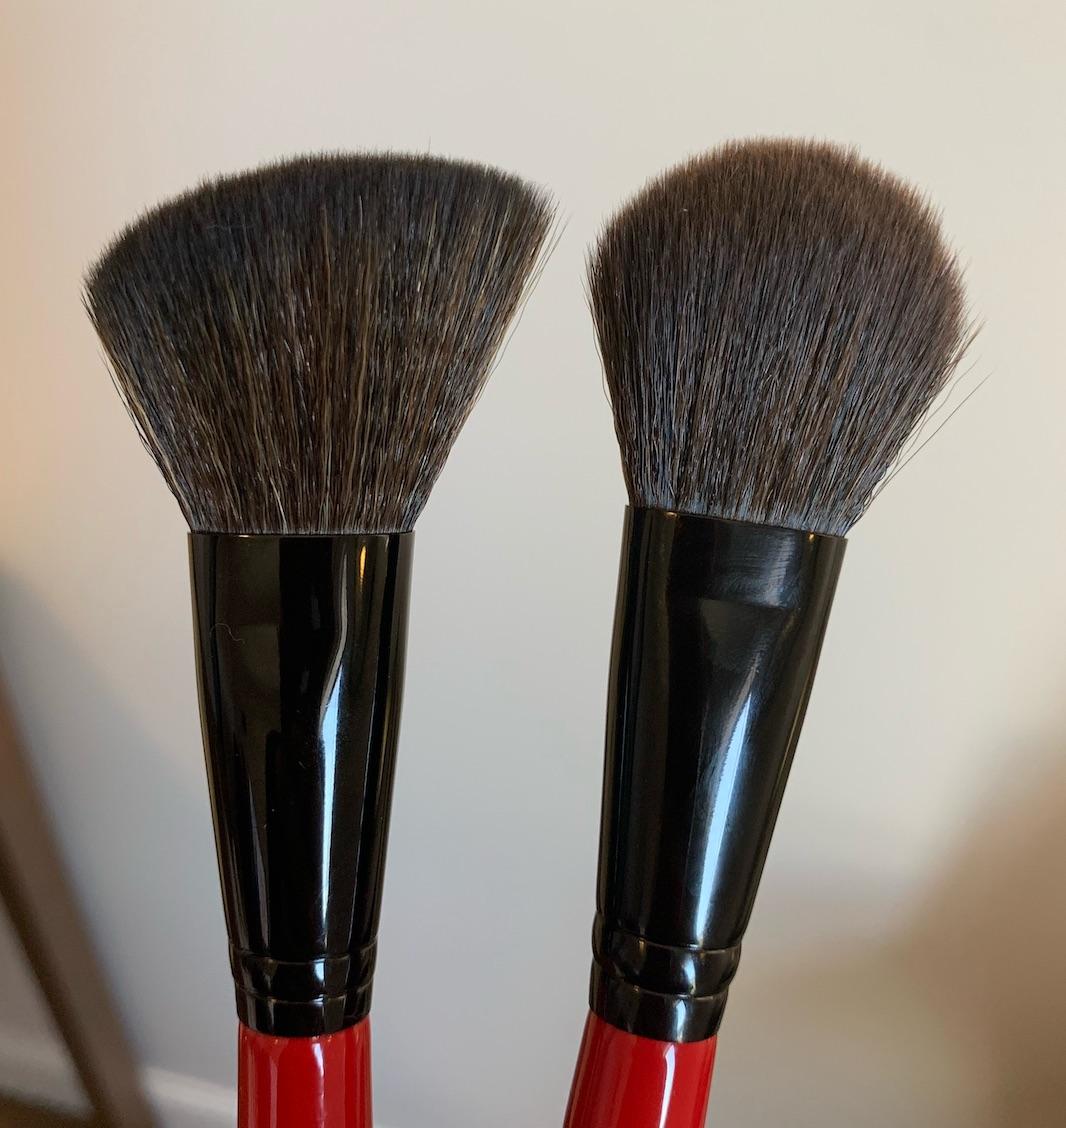 Smashbox Brush Review (angled blush and precise blush)